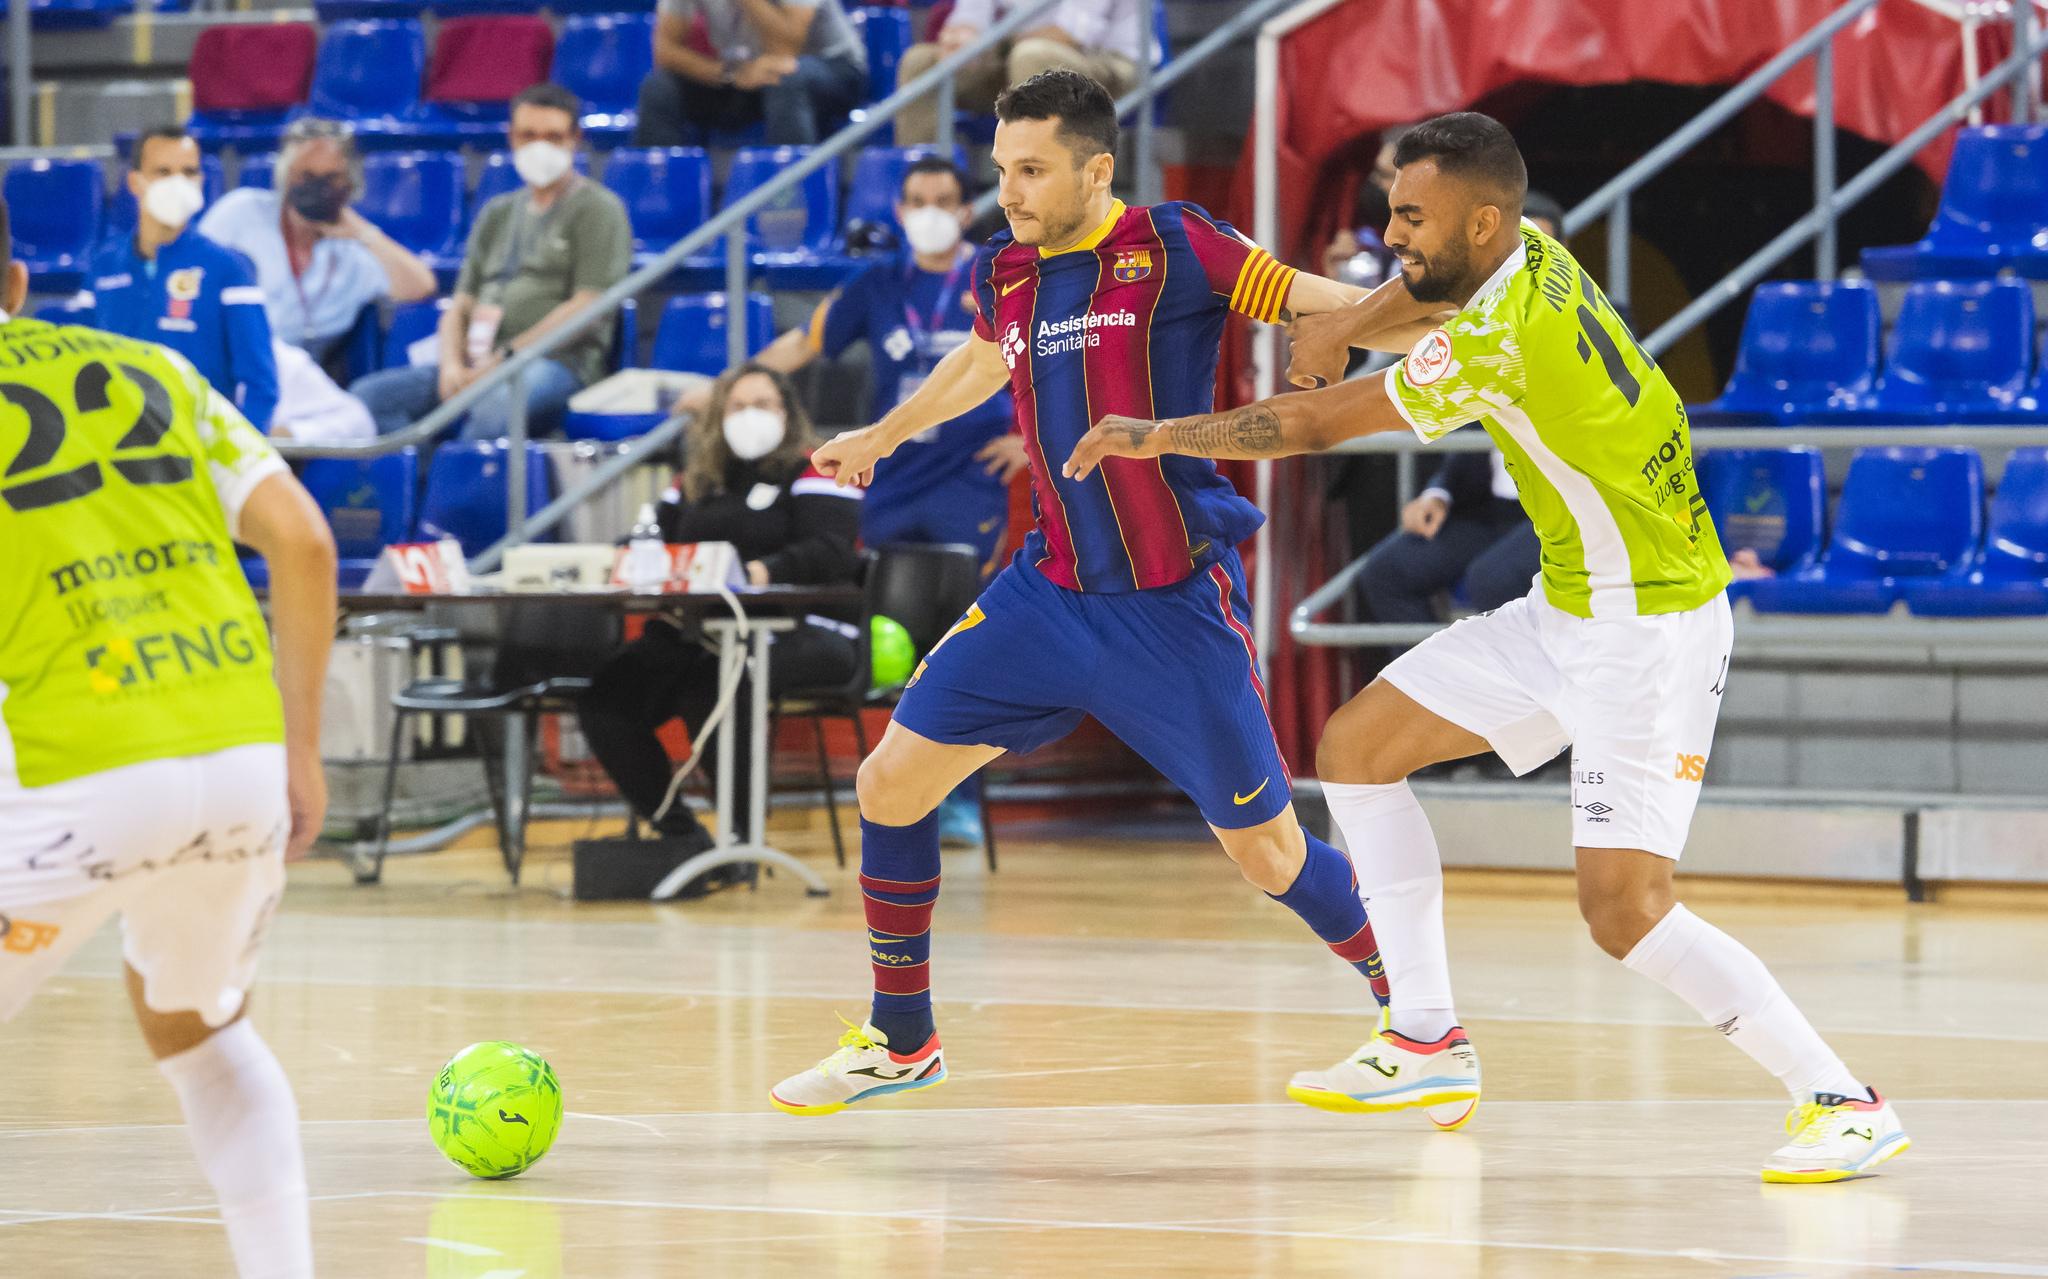 Dyego y Diego Nunes disputan un balón